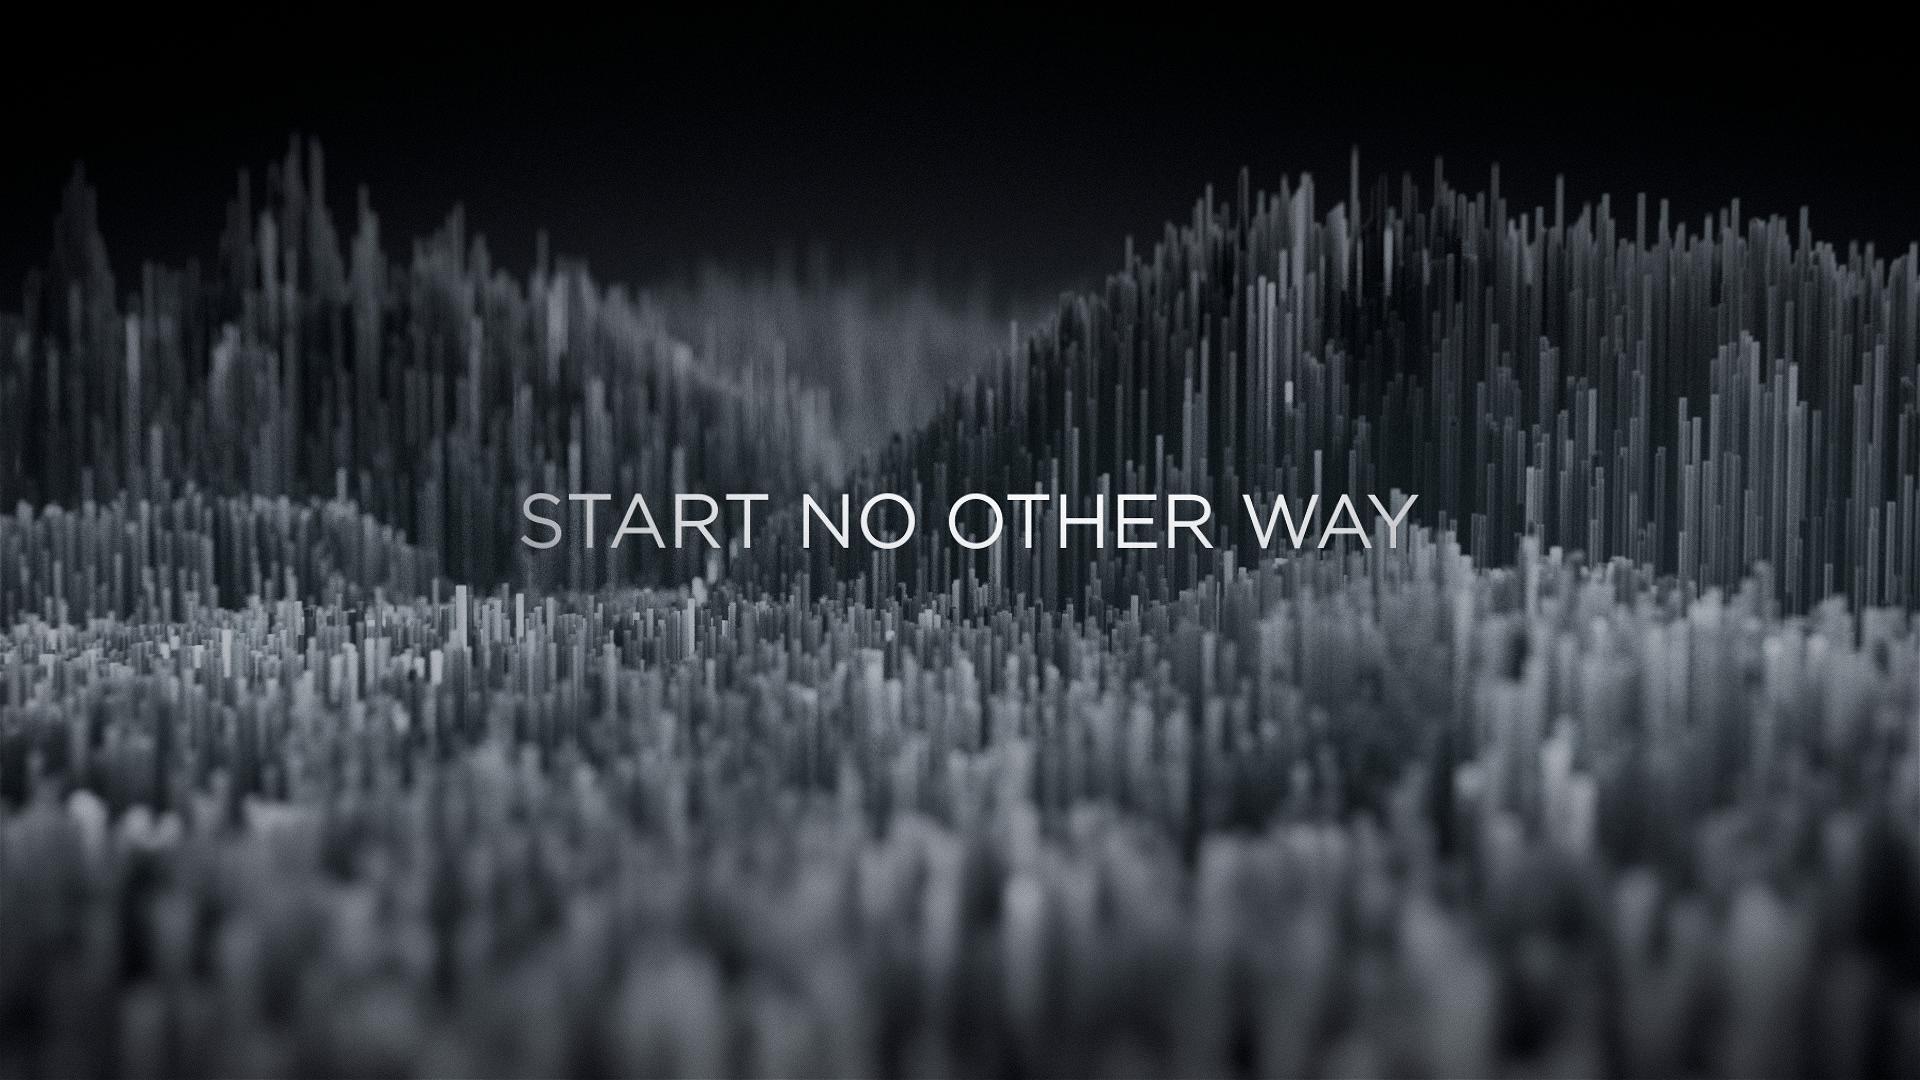 Start No Other Way